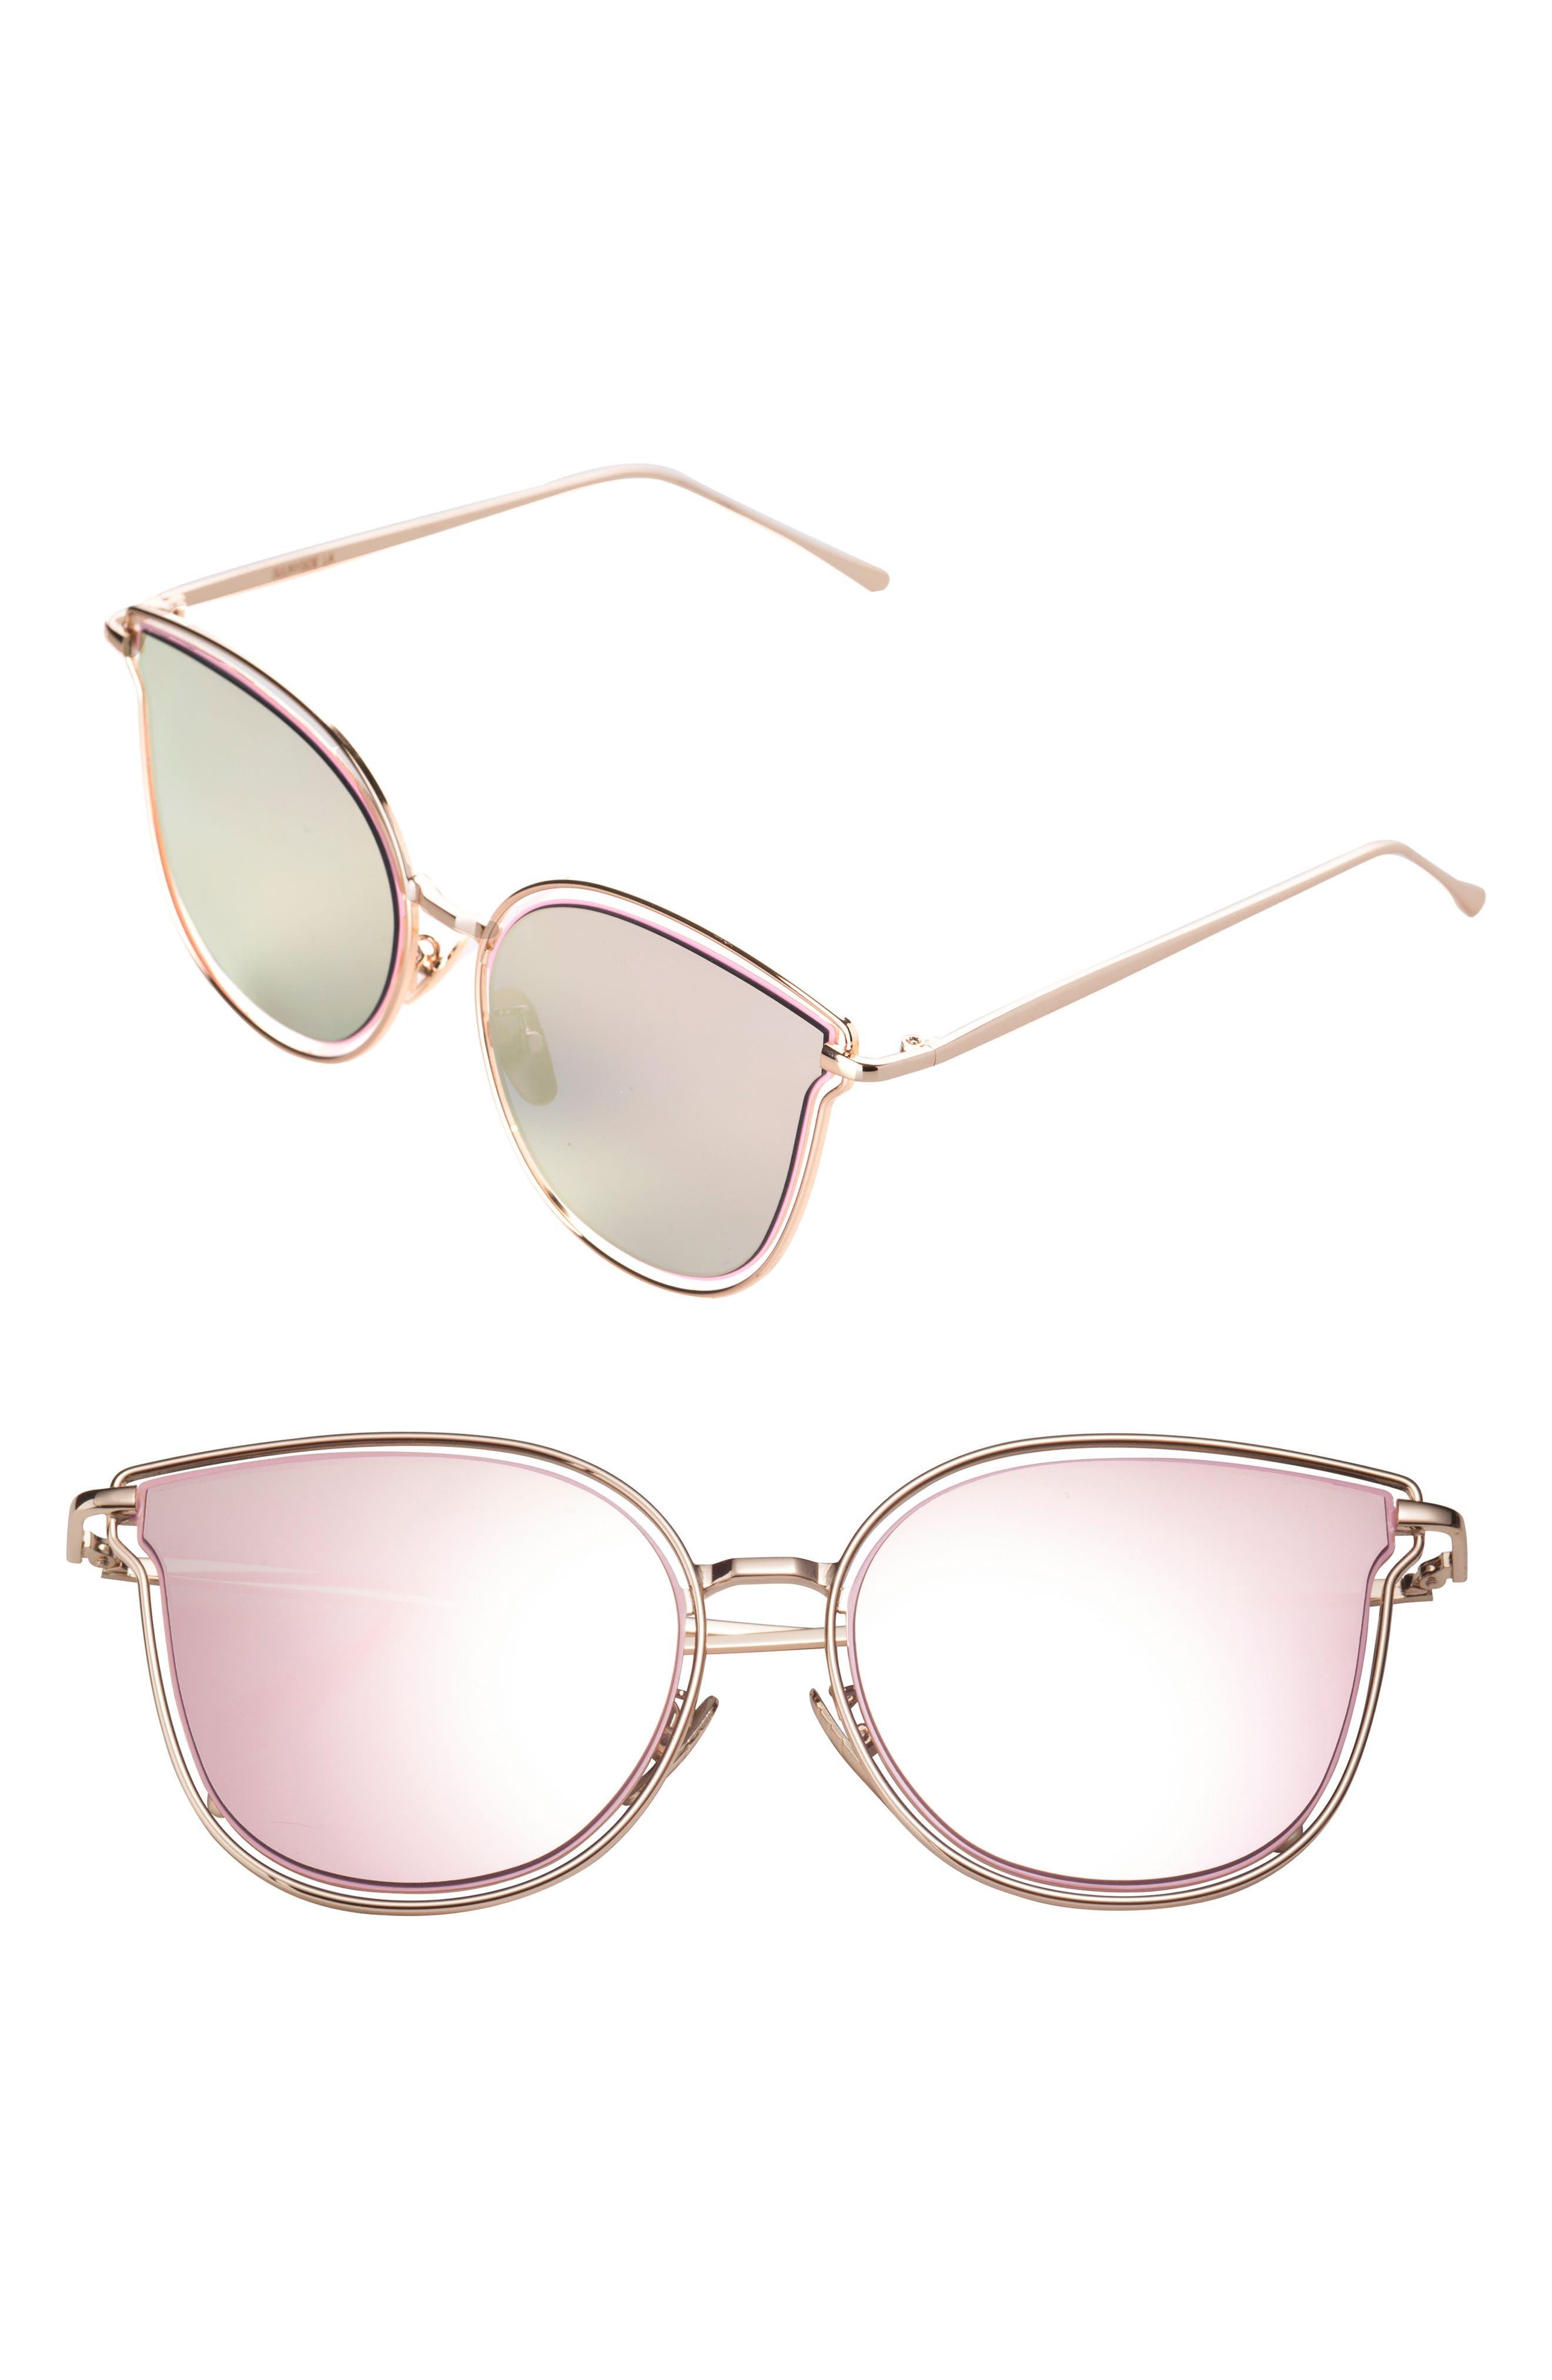 SunnySide LA 54mm Mirrored Cat Eye Sunglasses